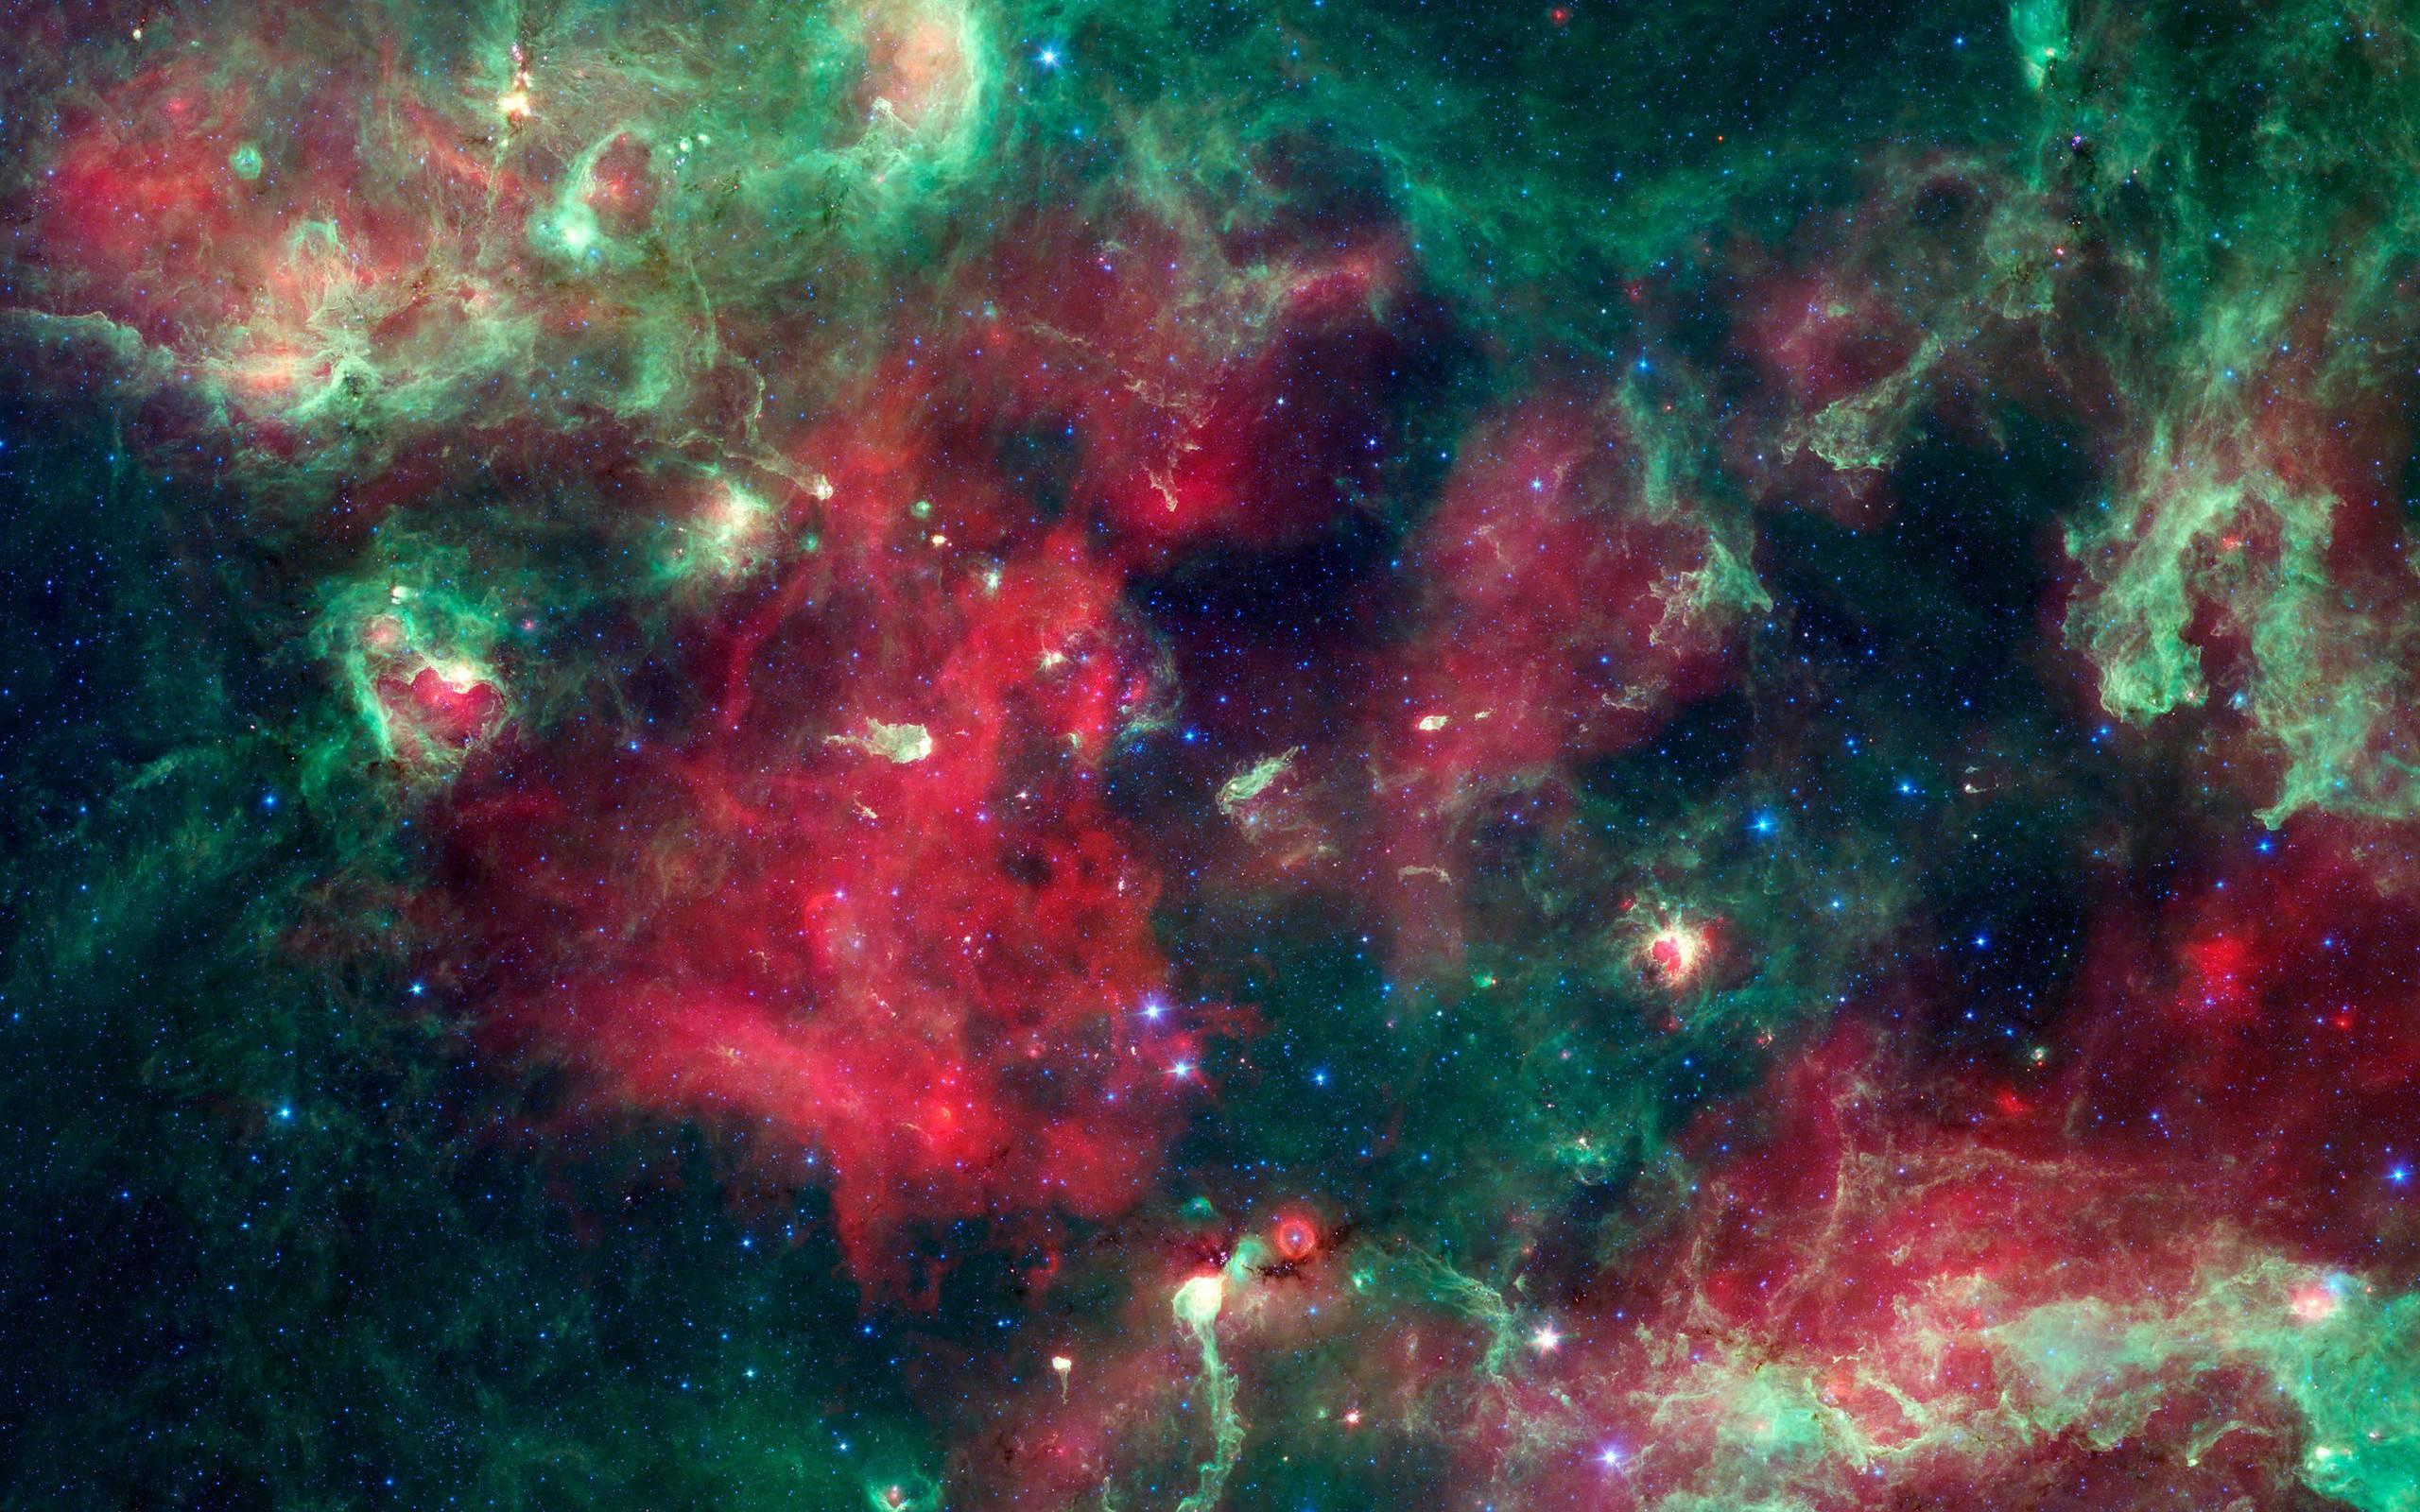 Nebula Backgrounds 2560x1600